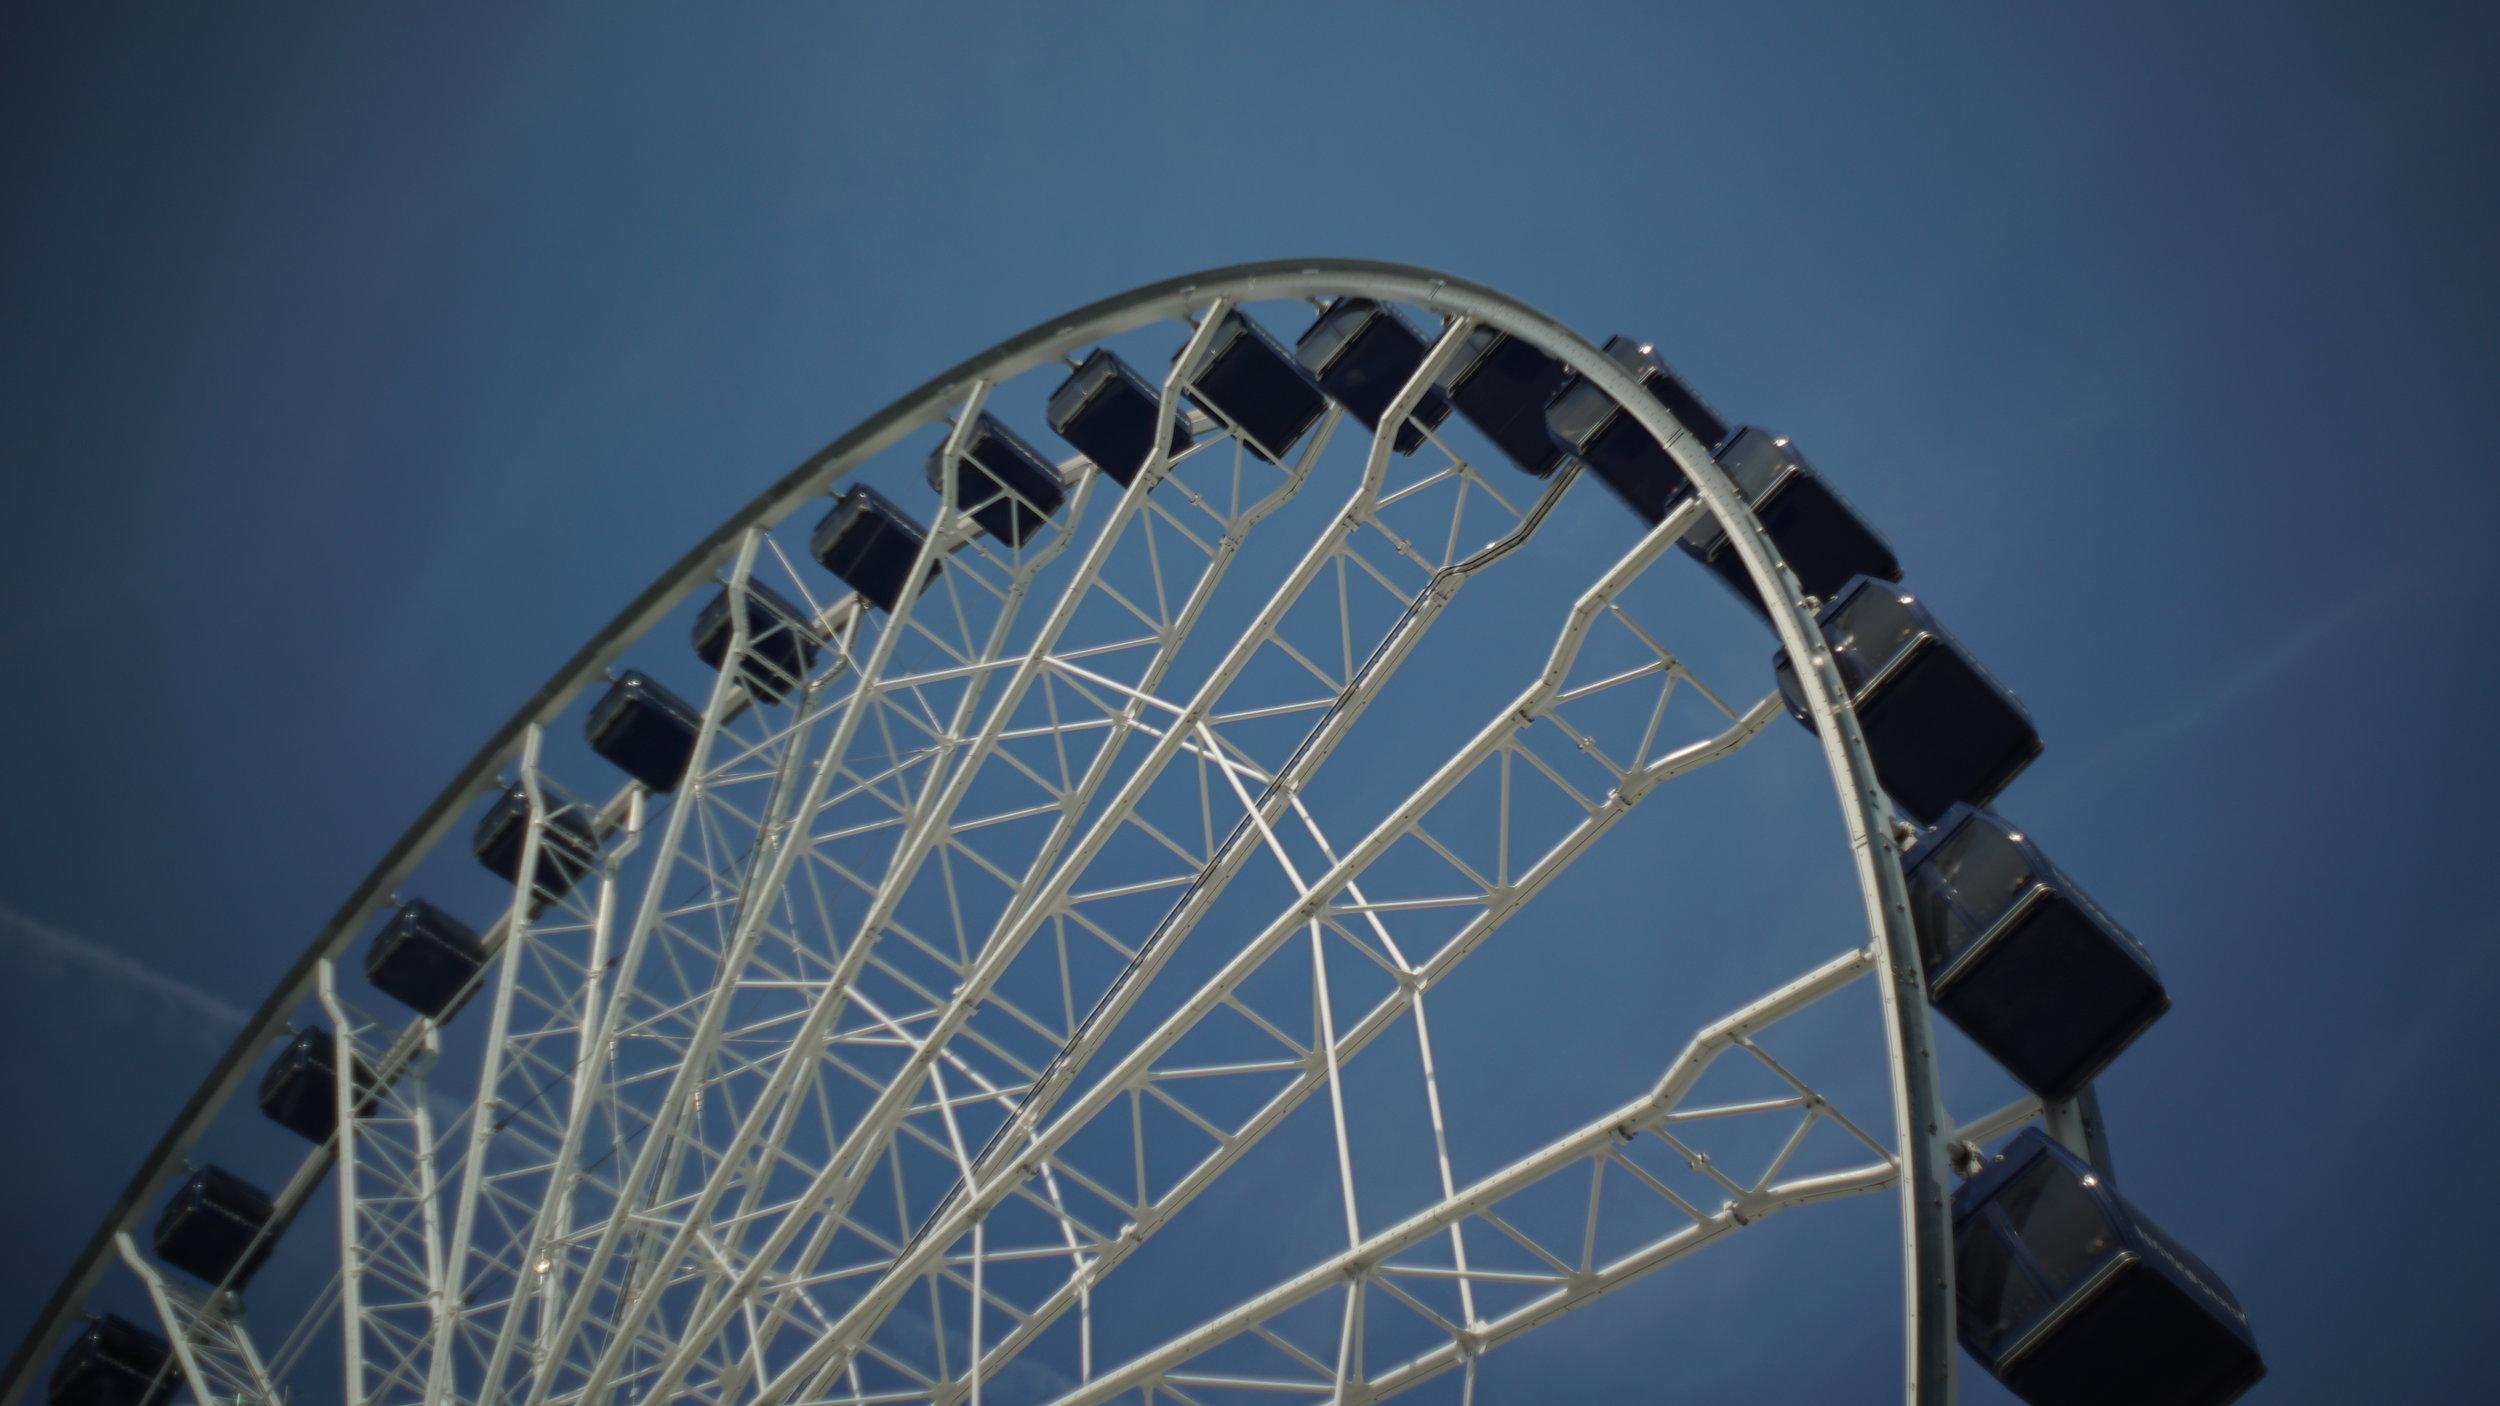 Ferris Wheel | Navy Pier